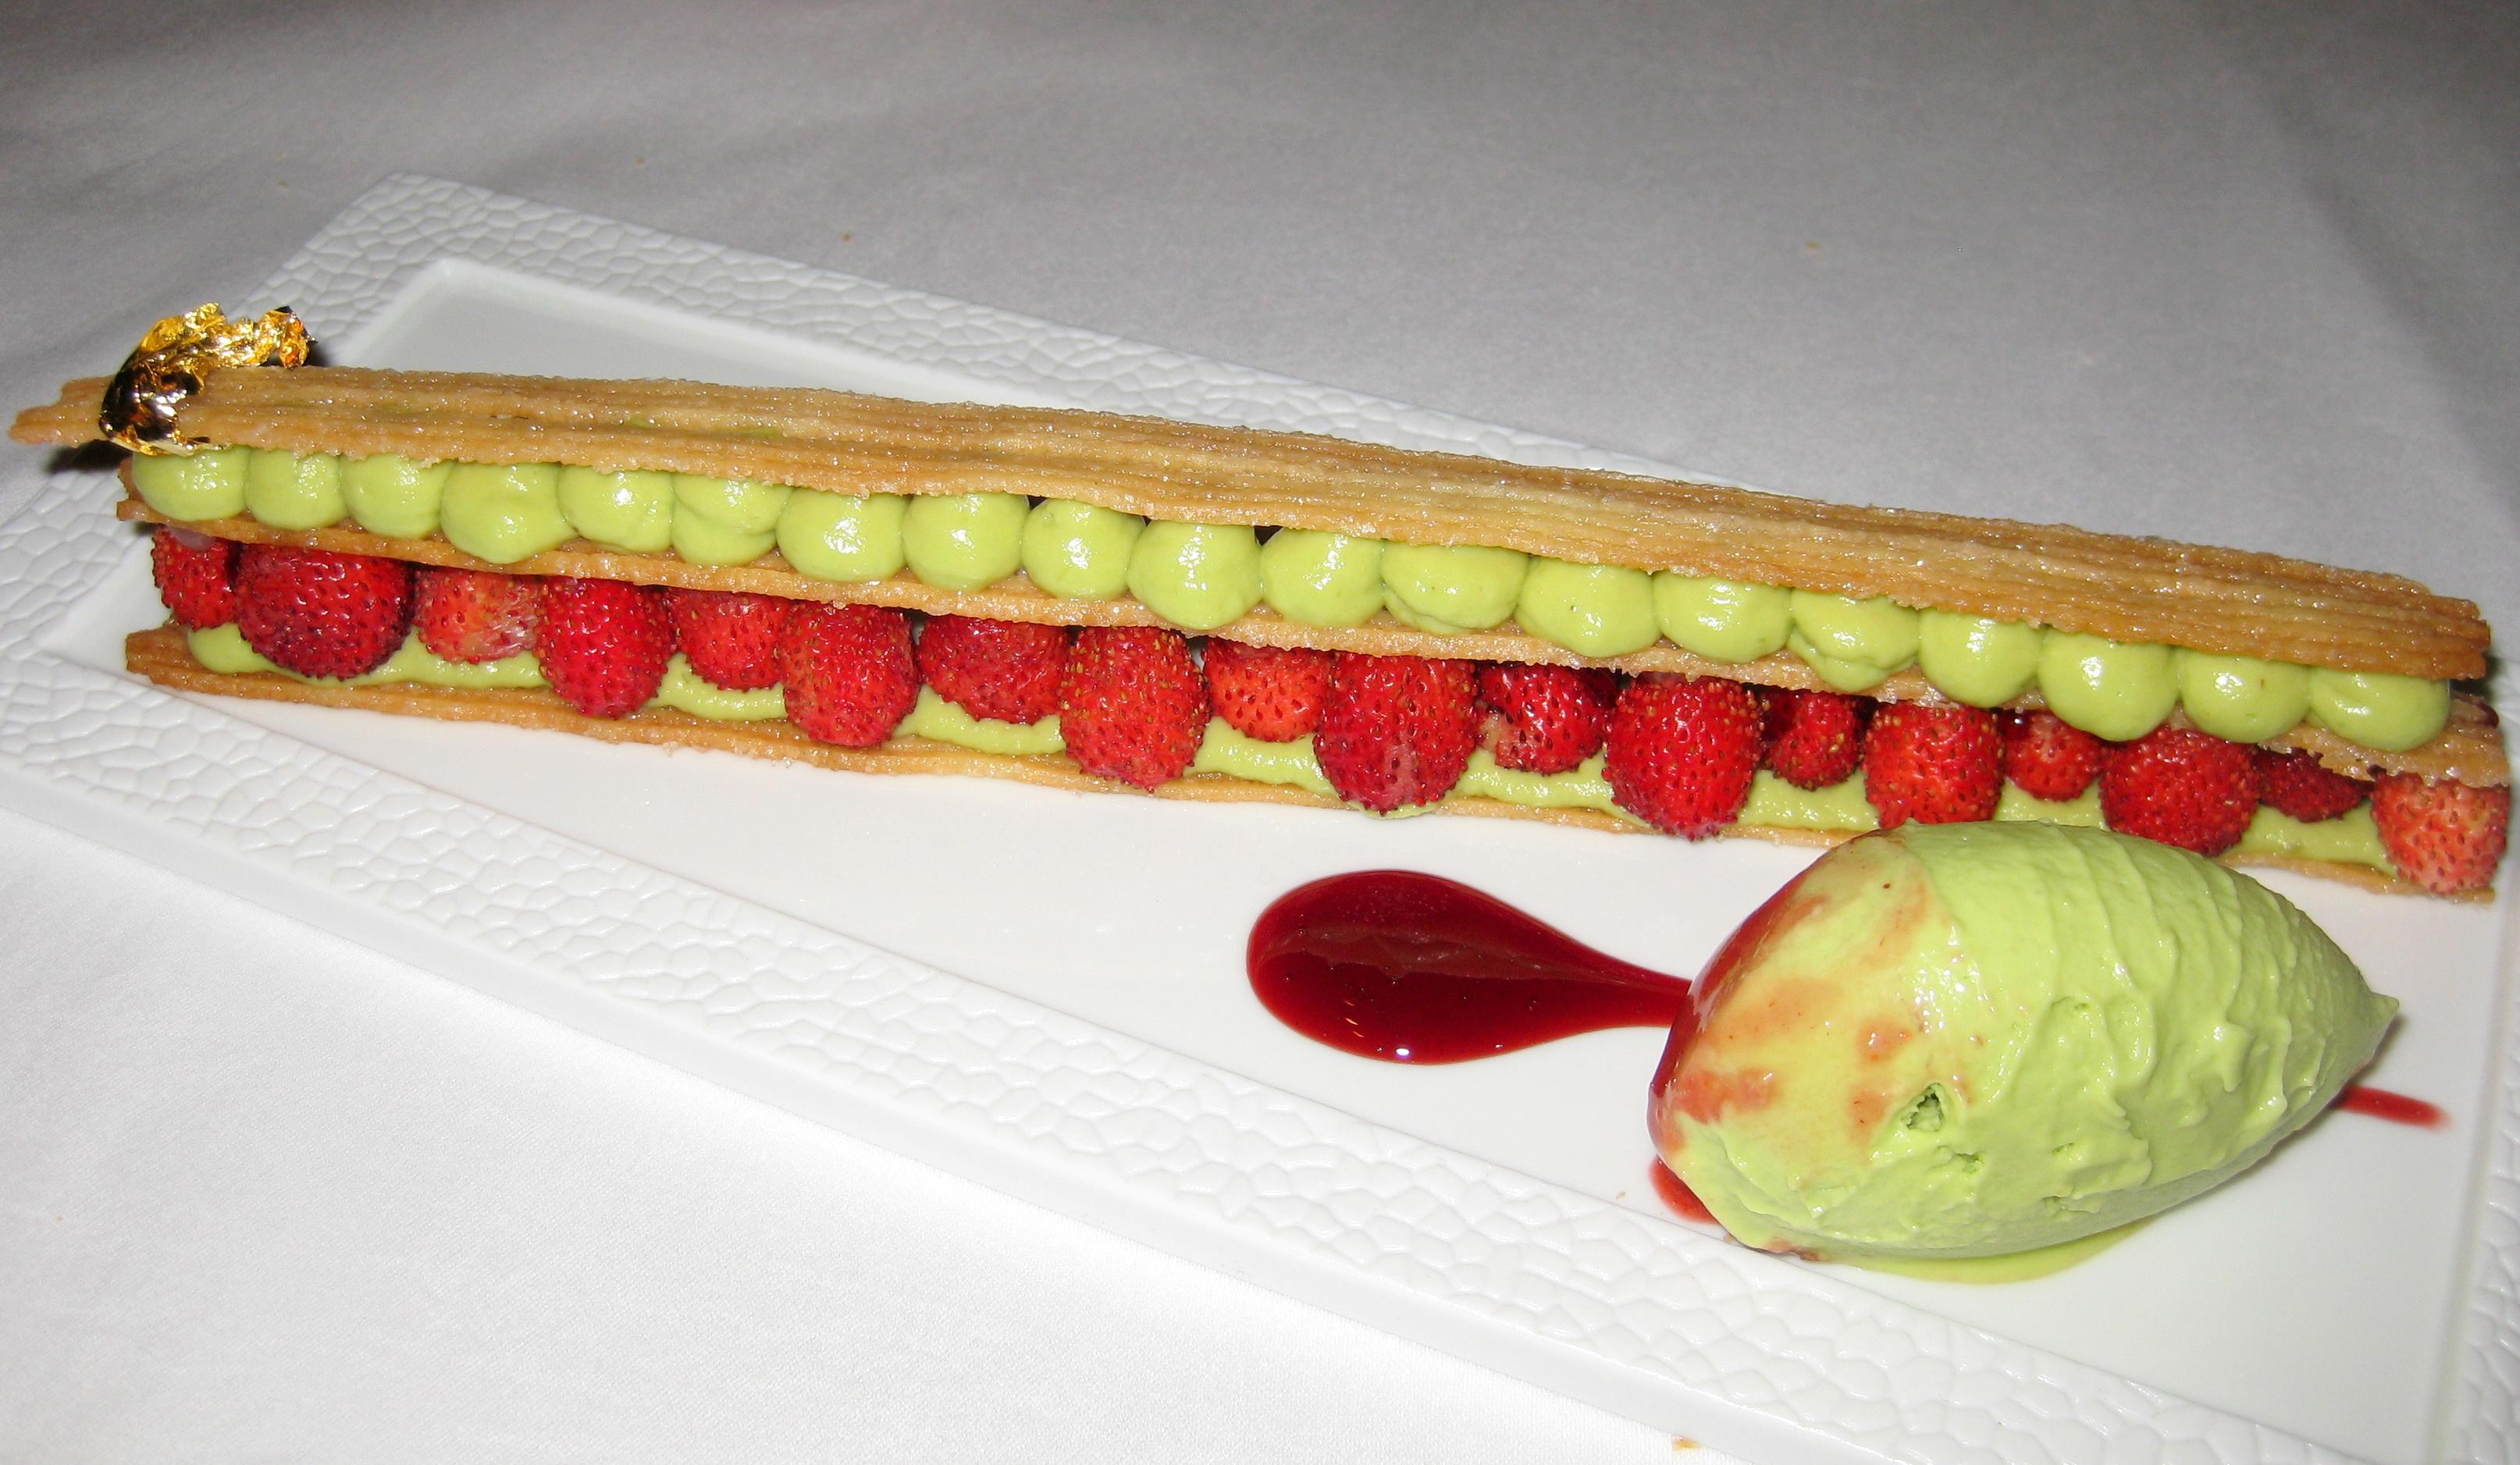 fraises des bois millefeuille with avocado mousse and. Black Bedroom Furniture Sets. Home Design Ideas